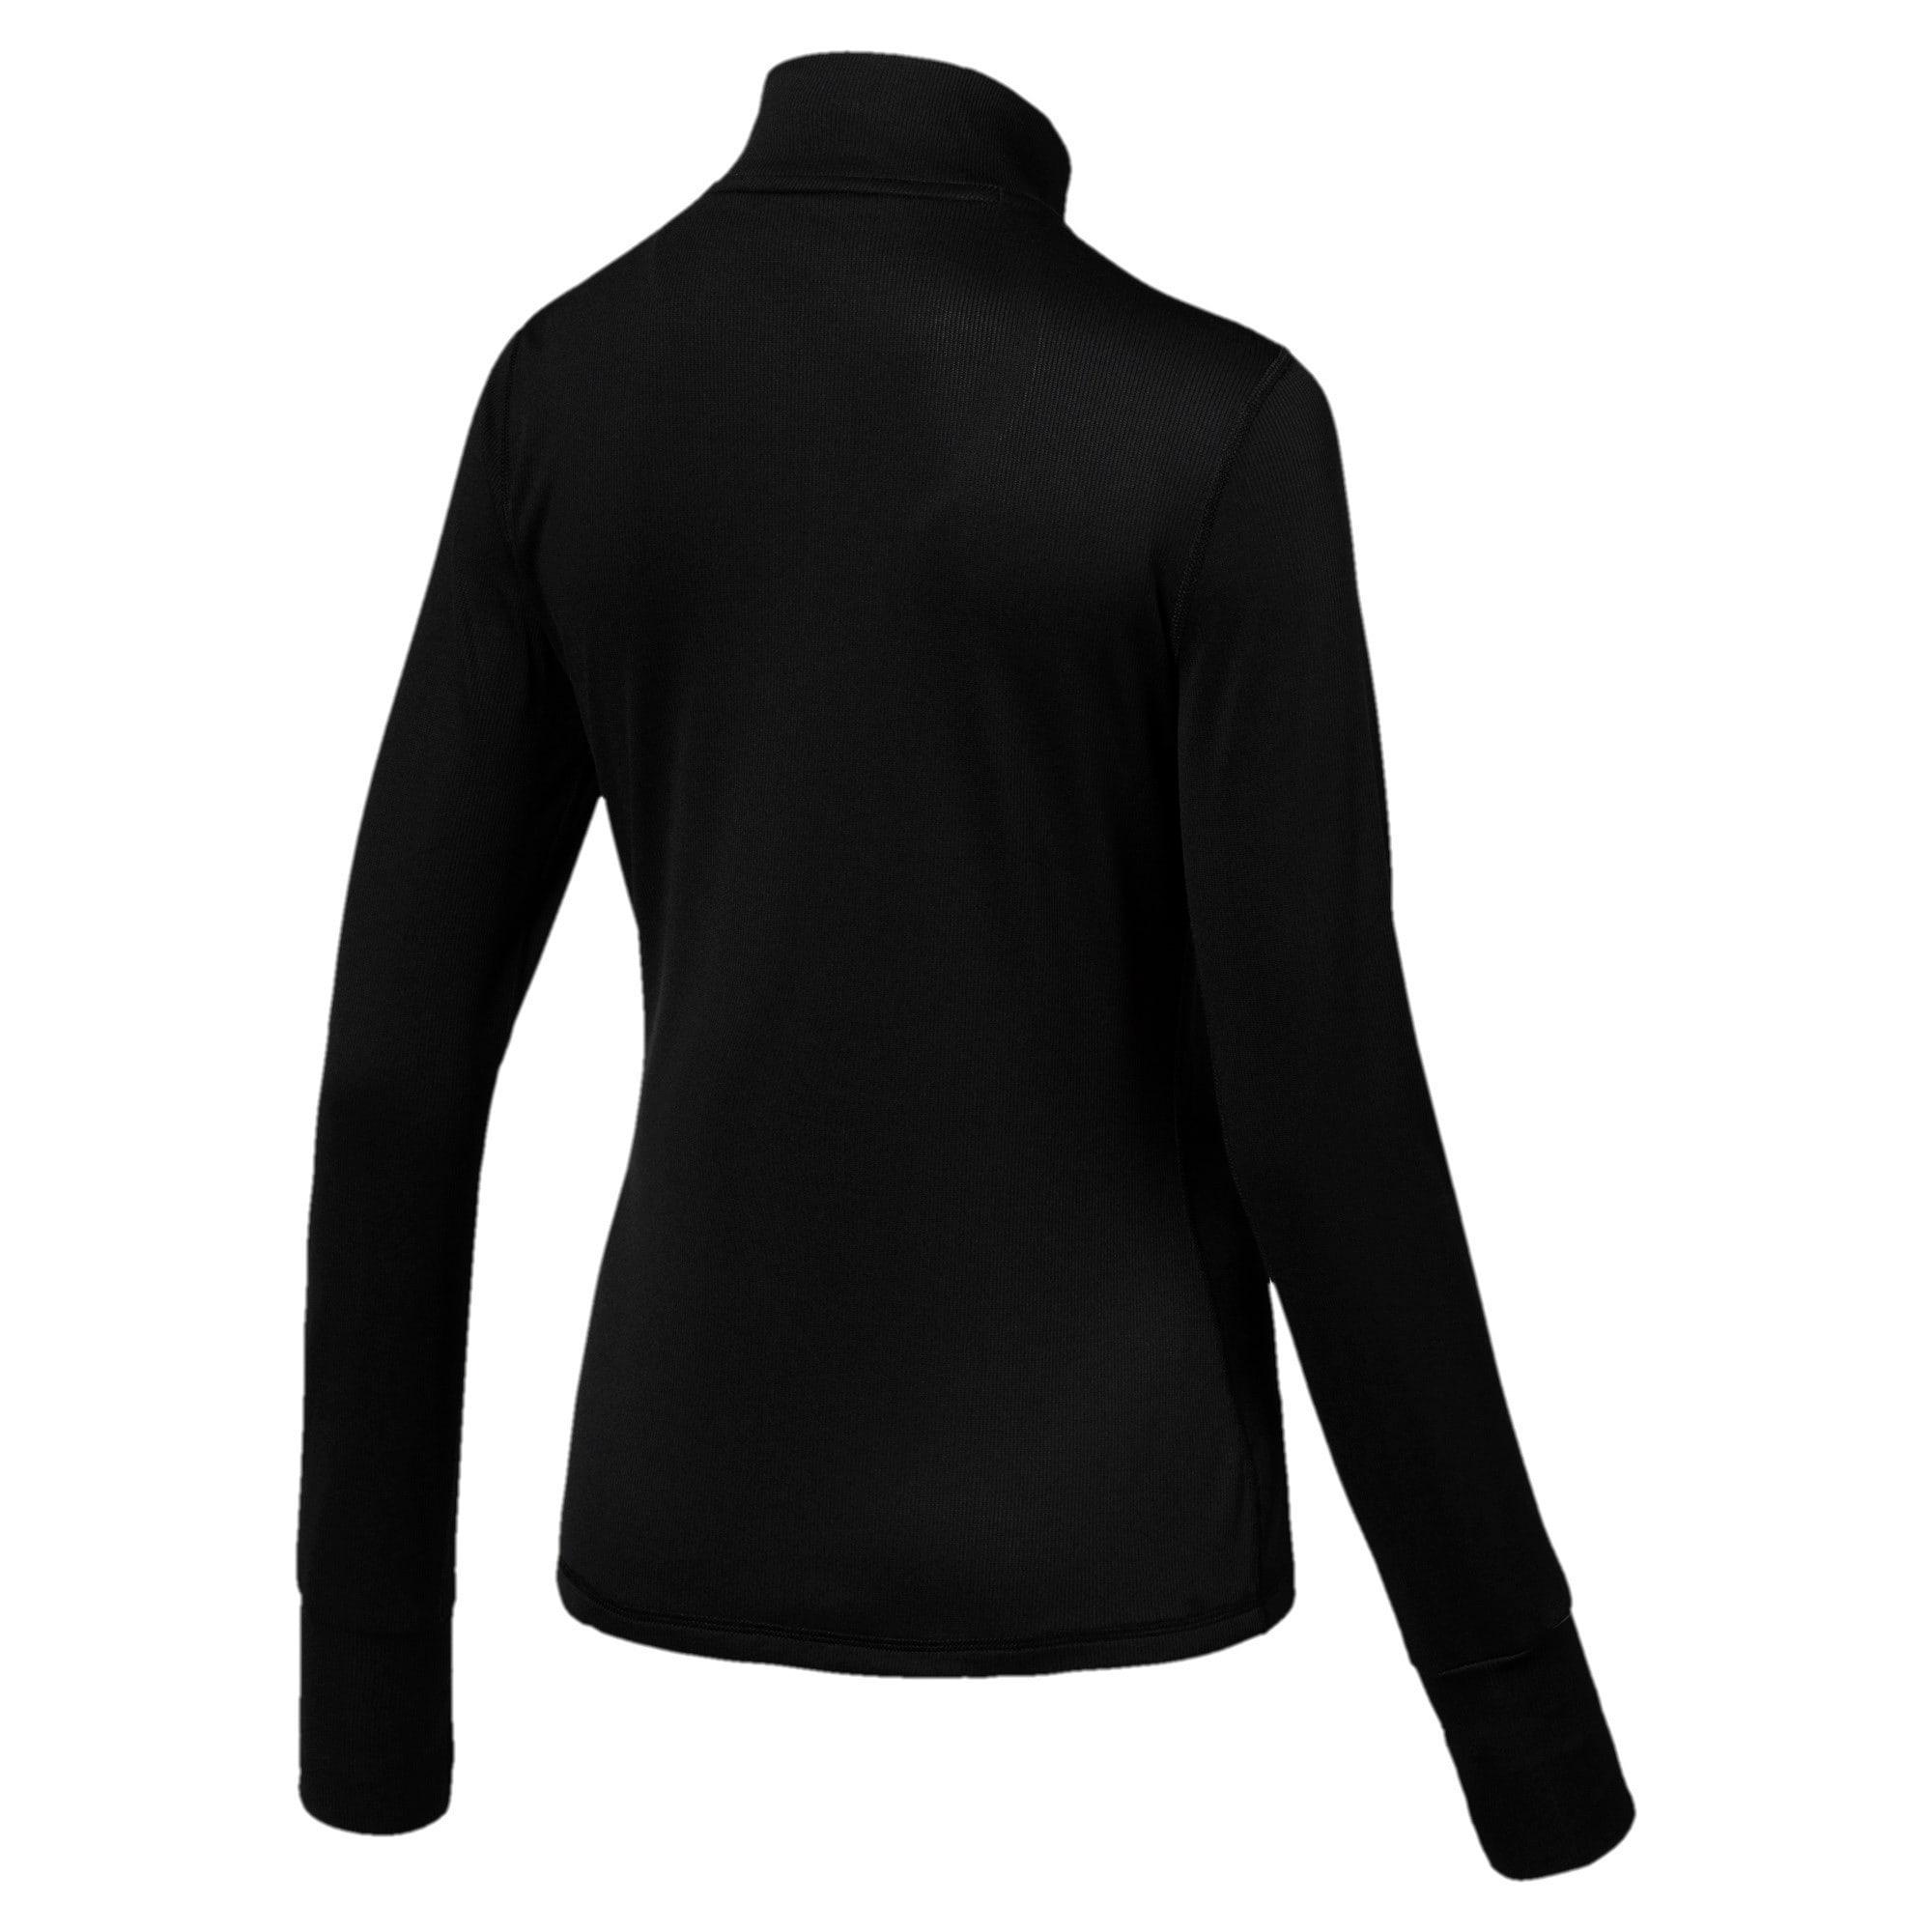 Thumbnail 4 of Ignite Half Zip Women's Running Pullover, Puma Black, medium-IND